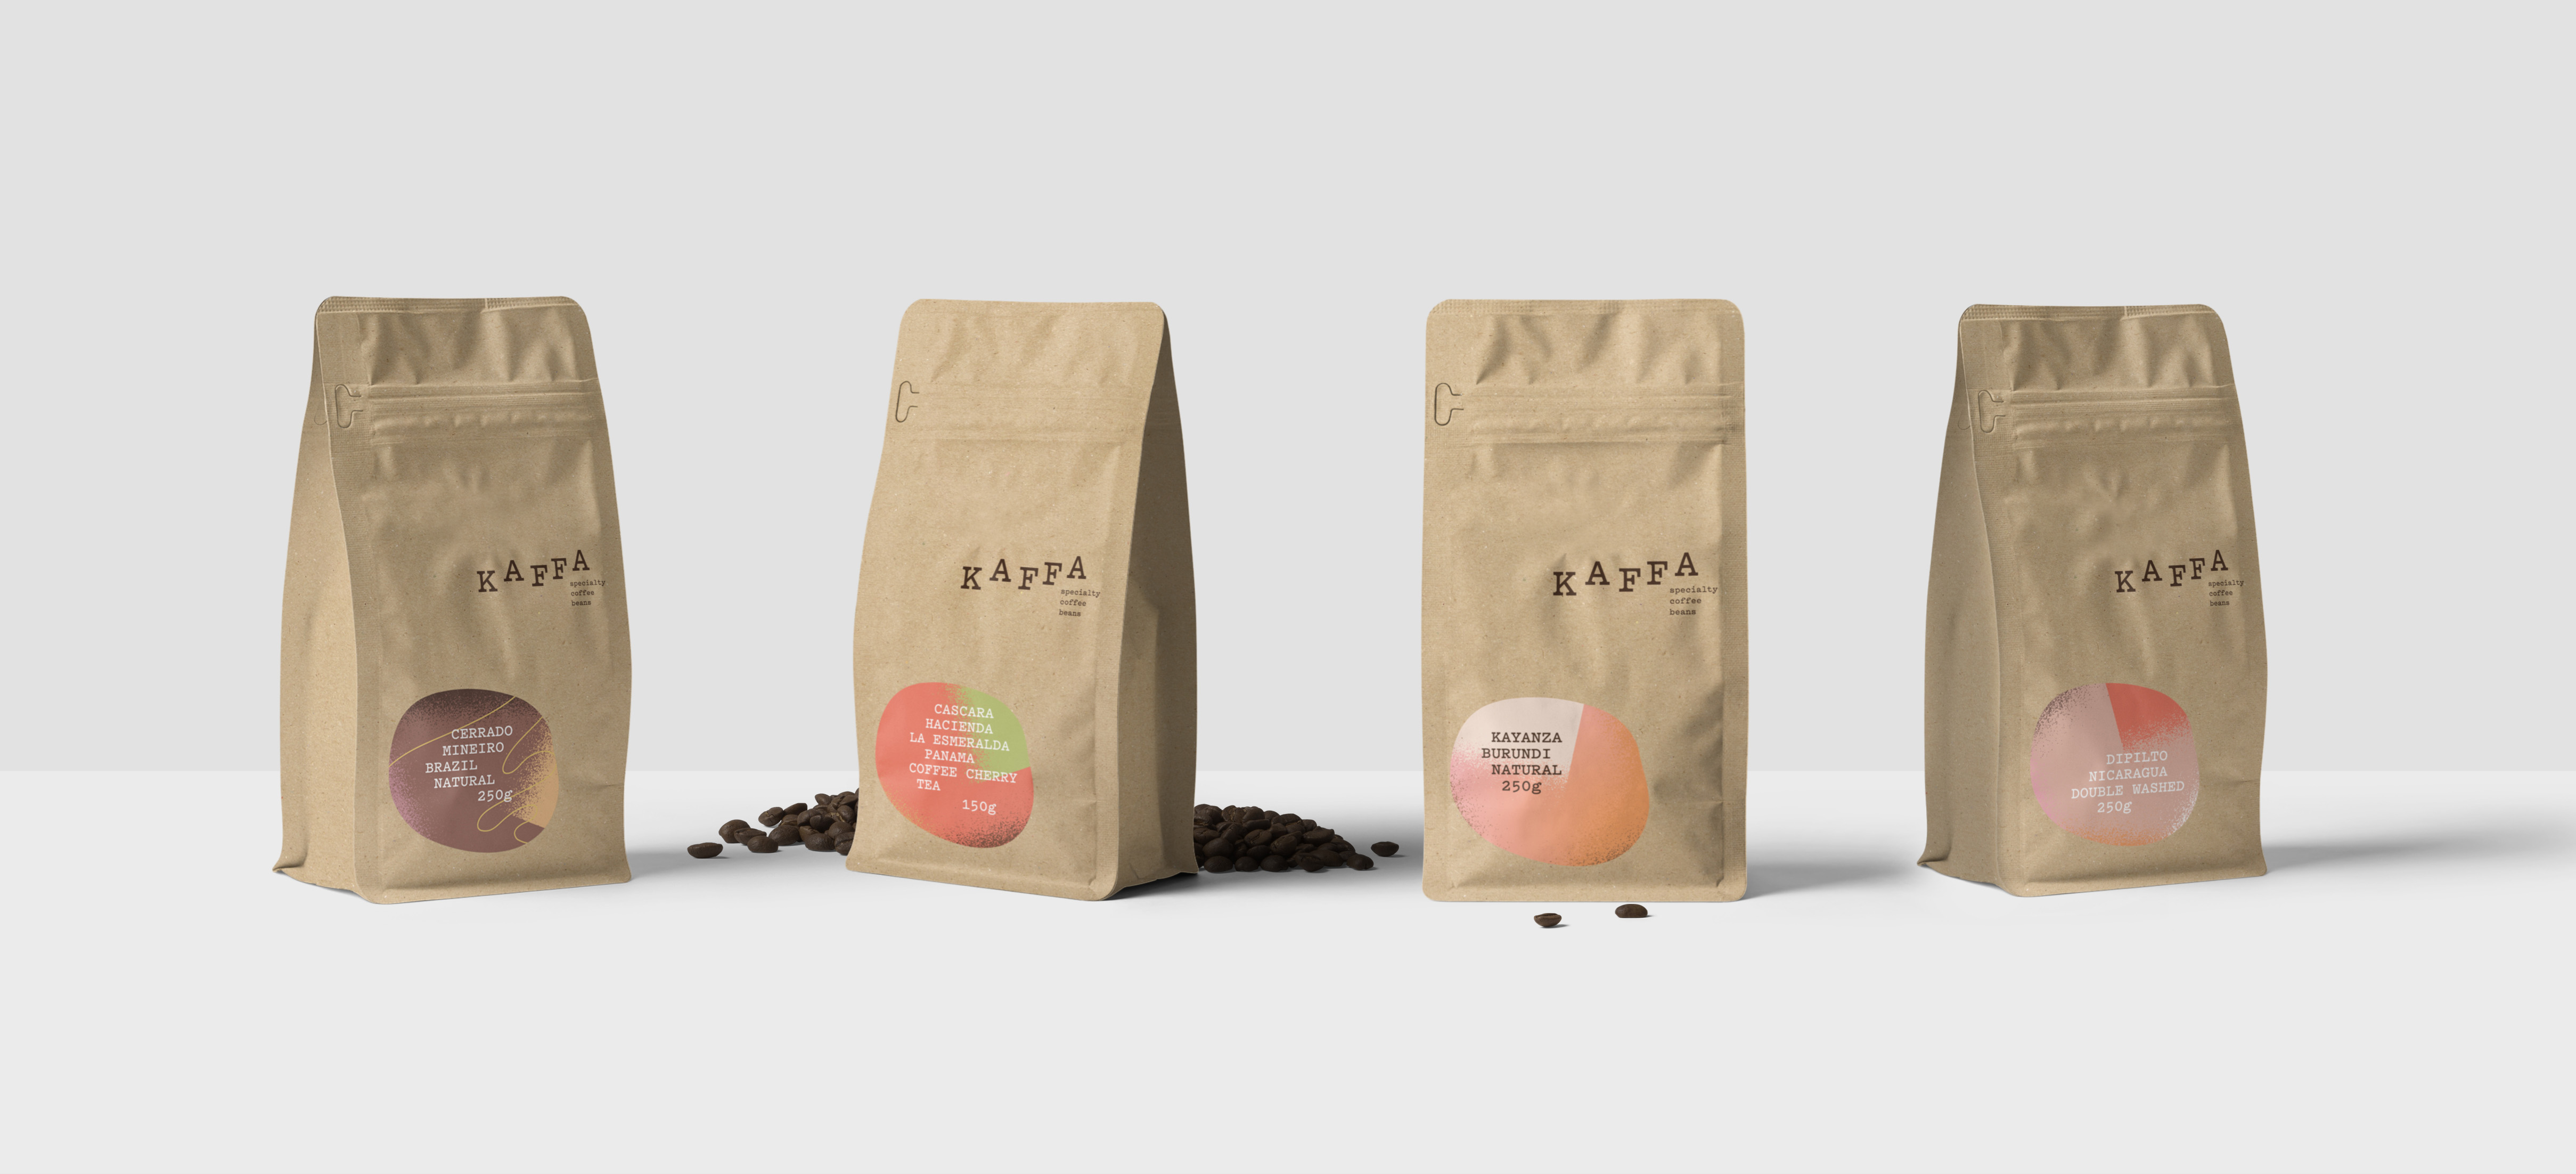 Kaffa the Specialty Coffee Brand